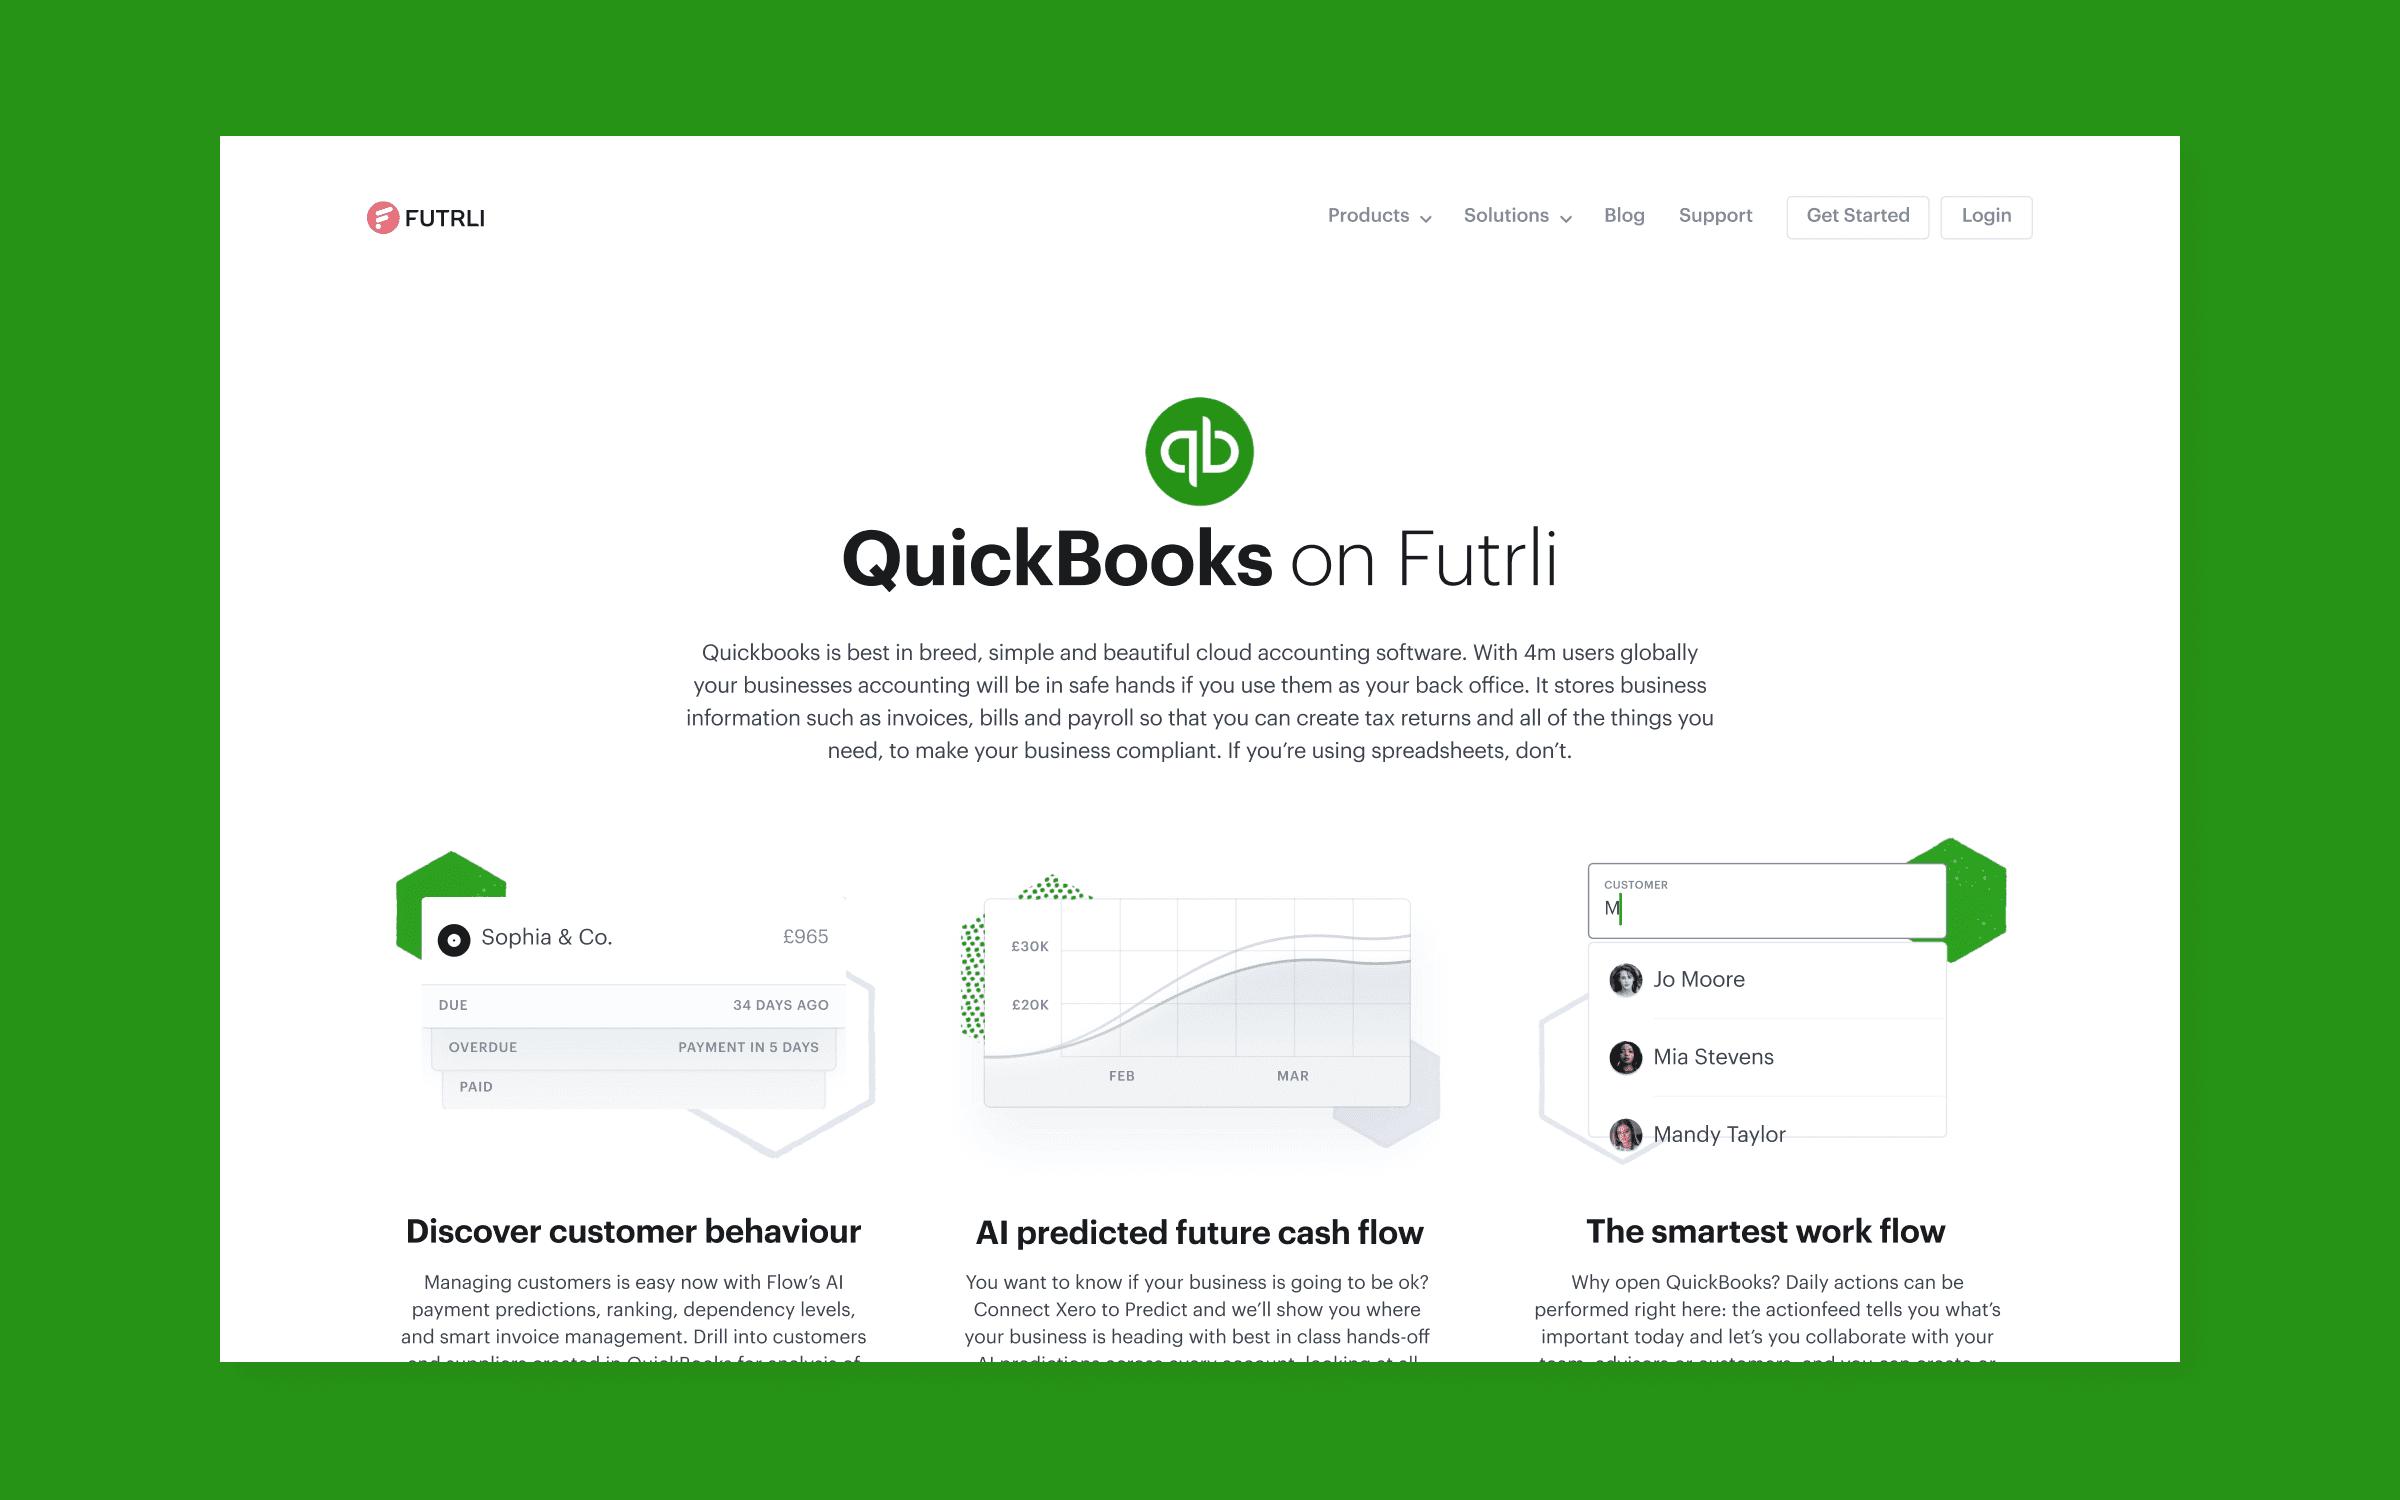 QuickBooks on Futrli